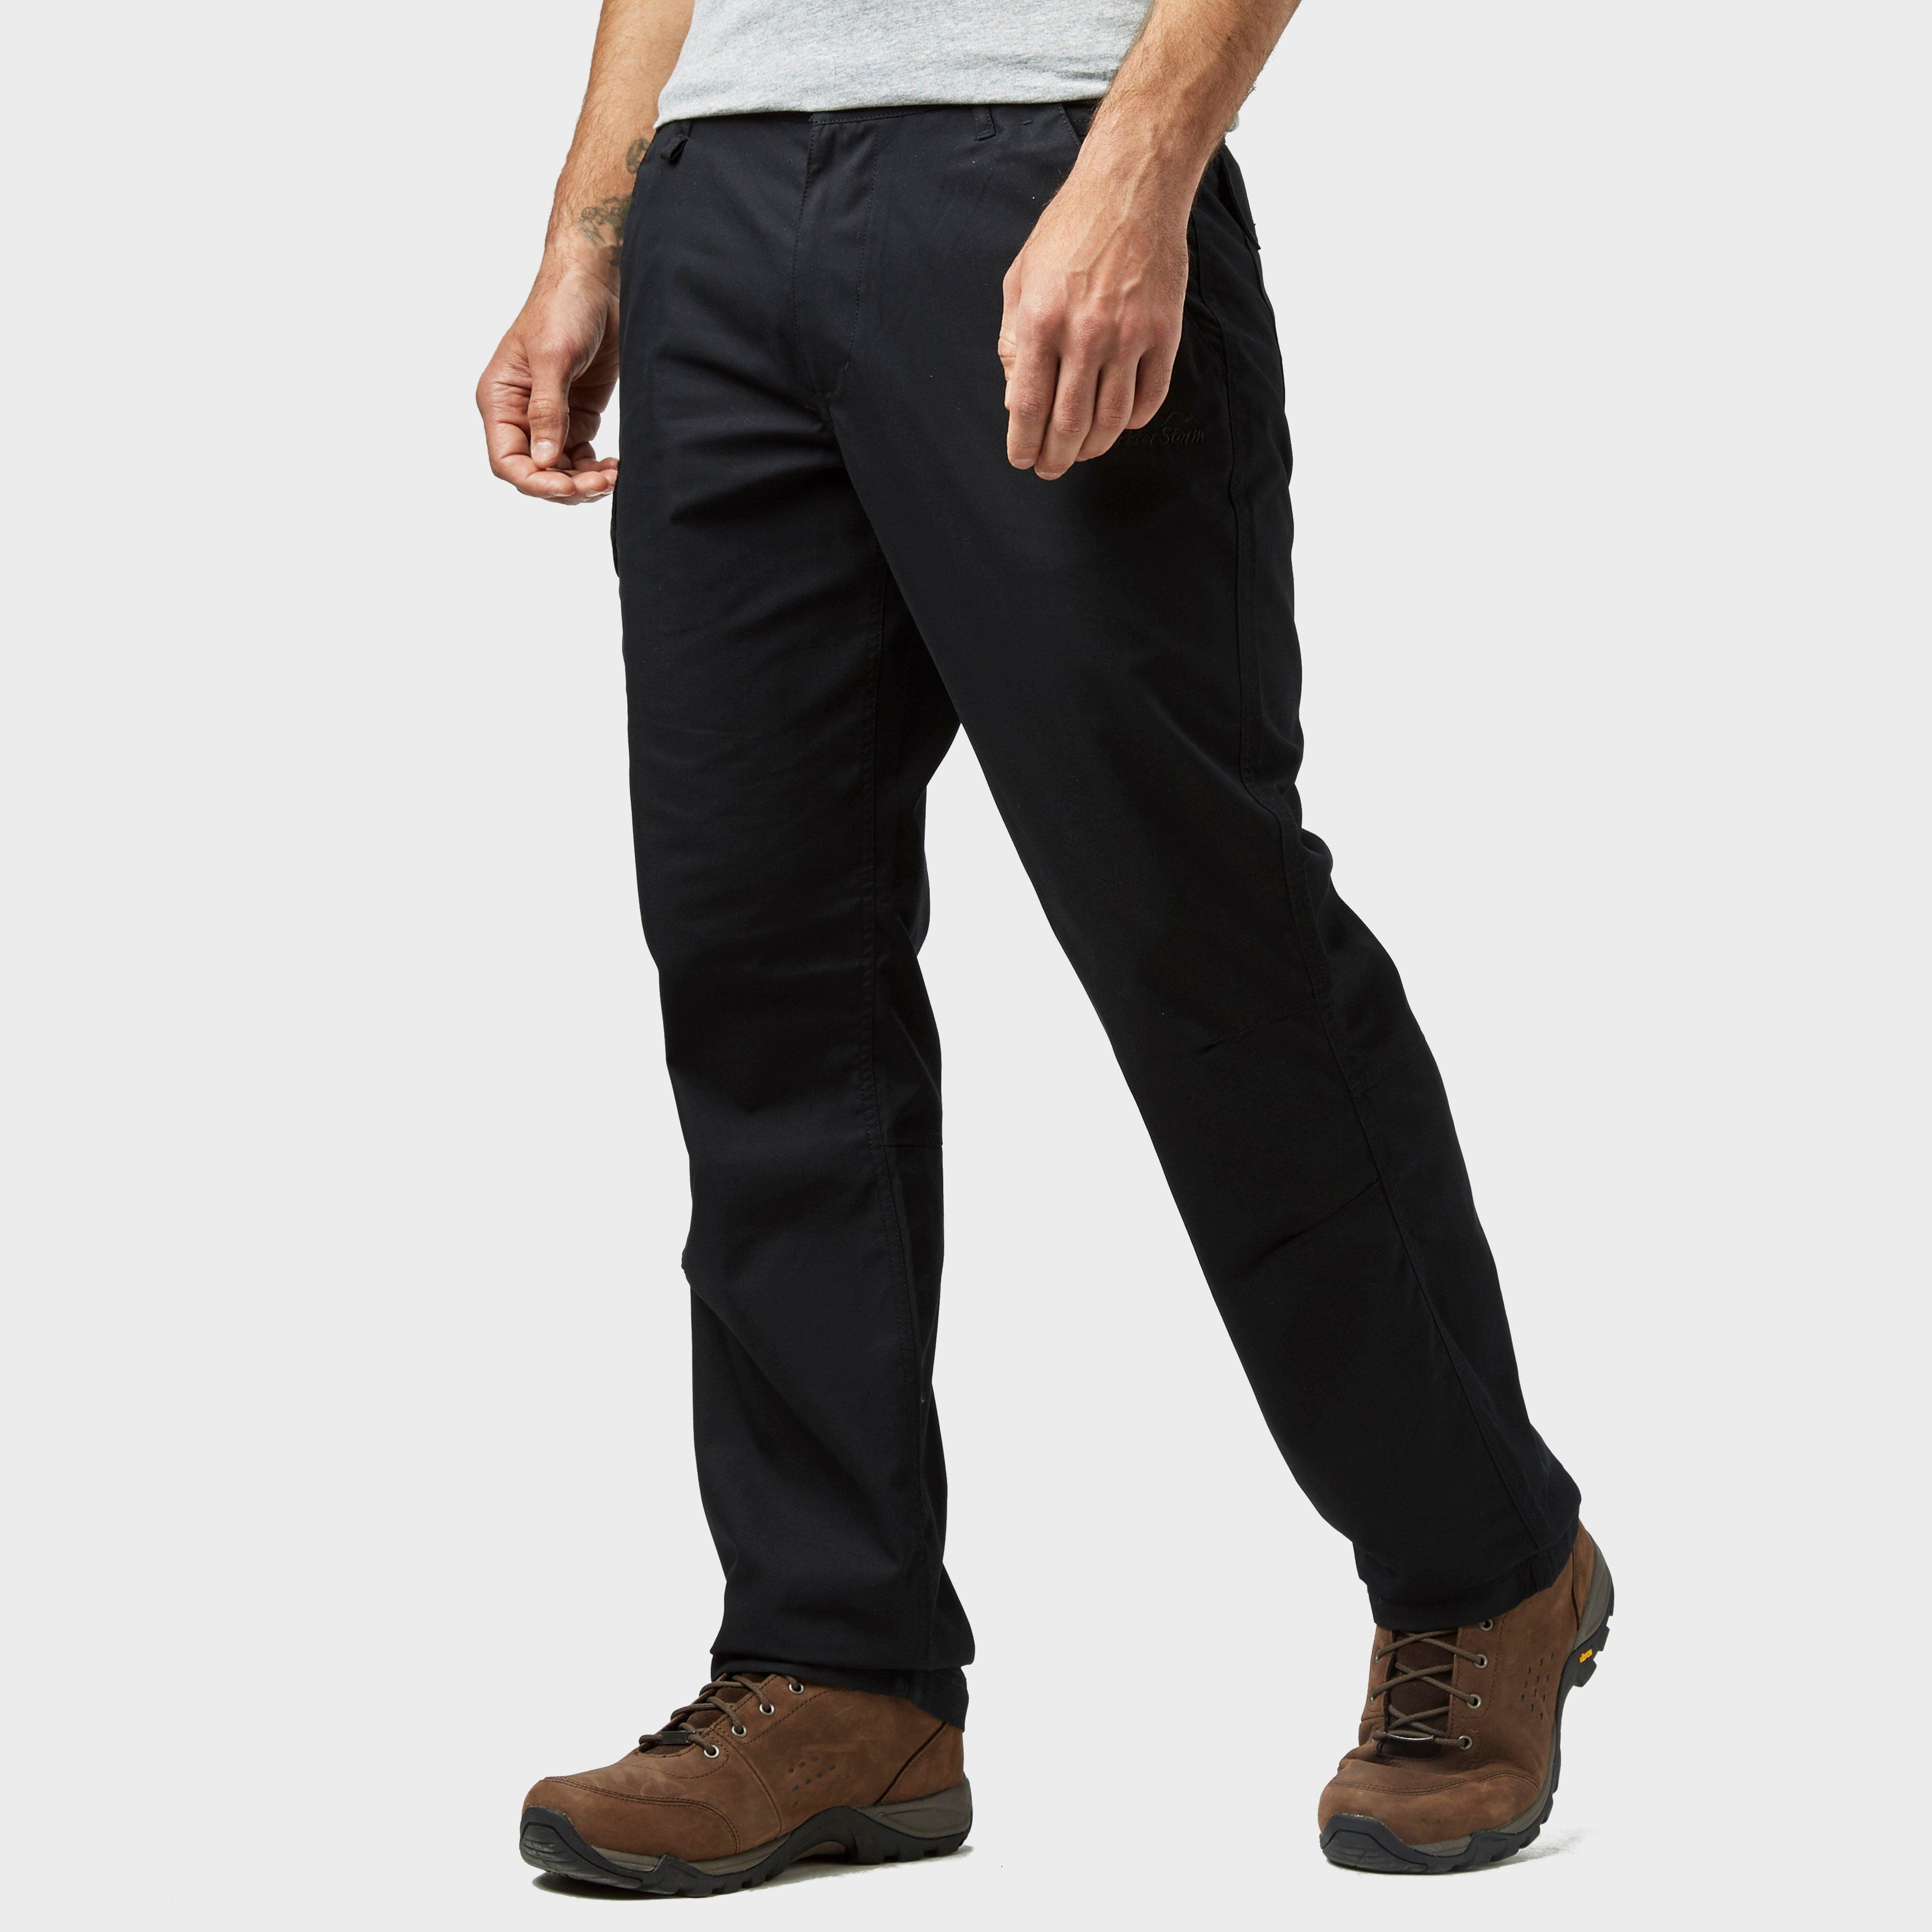 PETER STORM Men's Ramble II Trousers